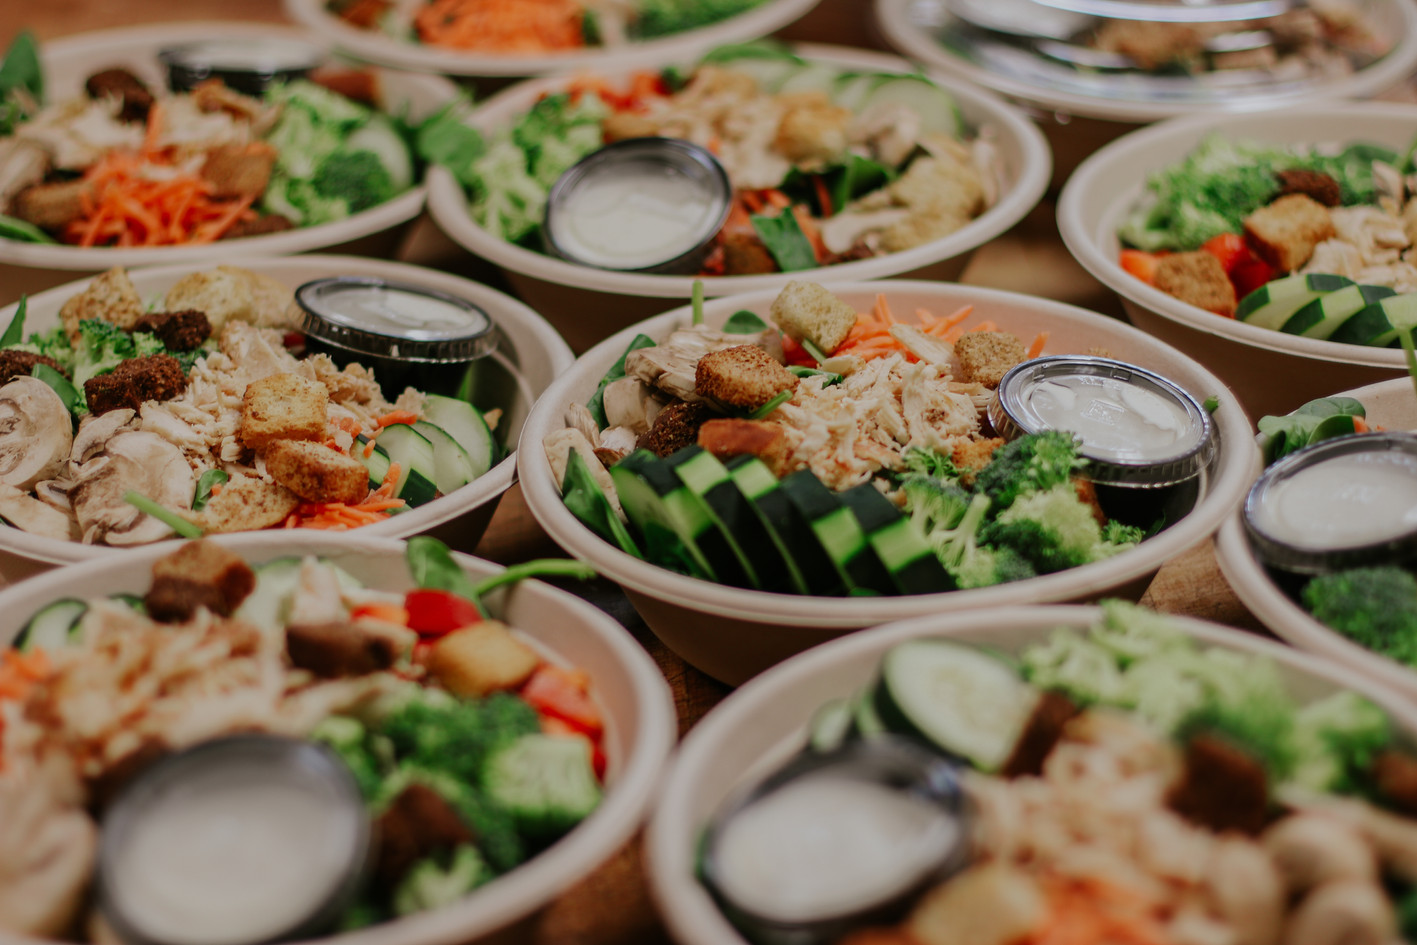 Salad Station Donations